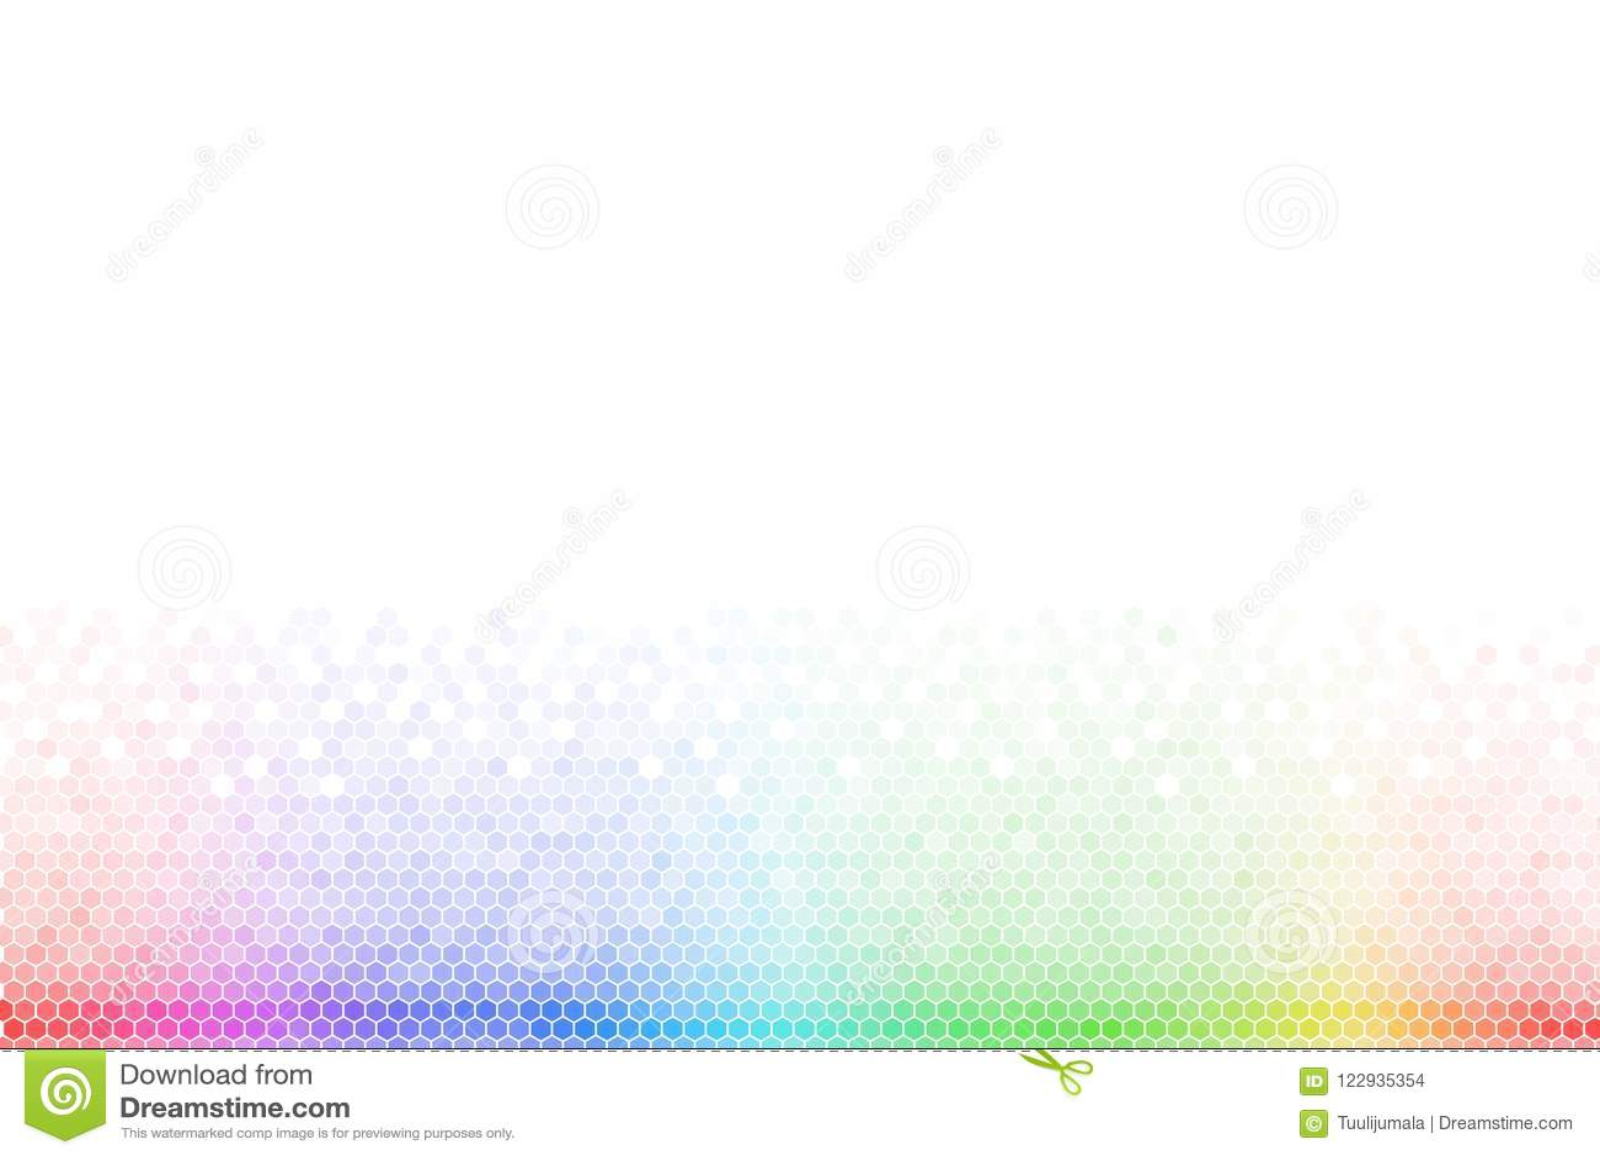 Abstract Rainbow Hexagon Mosaic Background Stock Vector